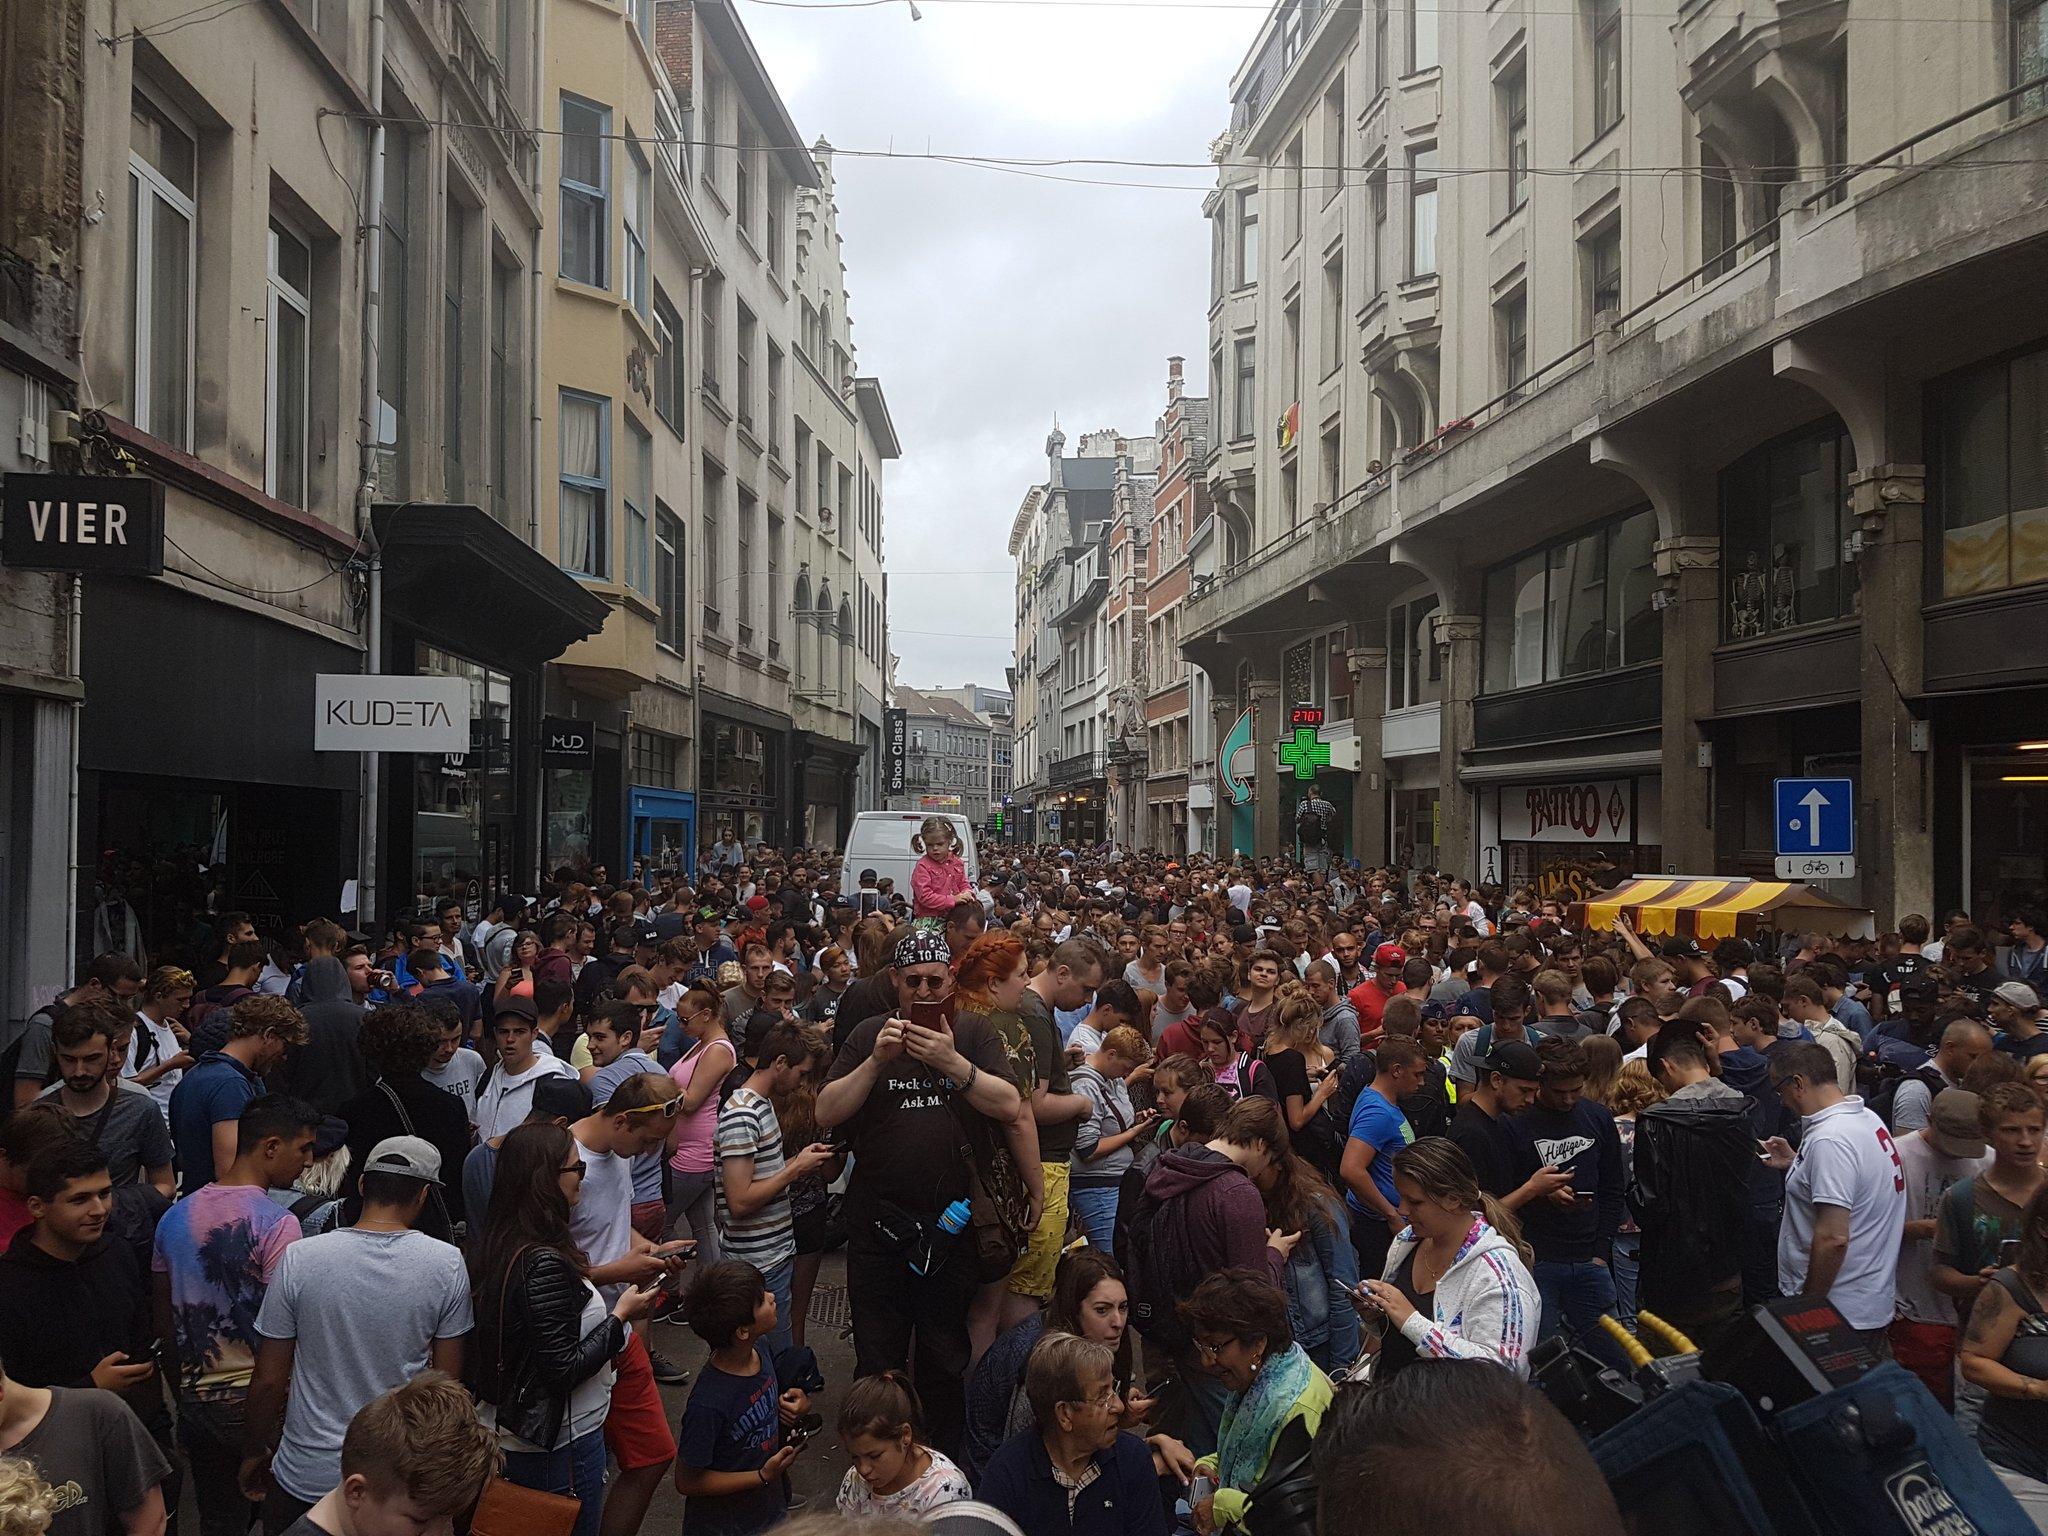 1000 Pokémon hunters gather in the Kammenstraat